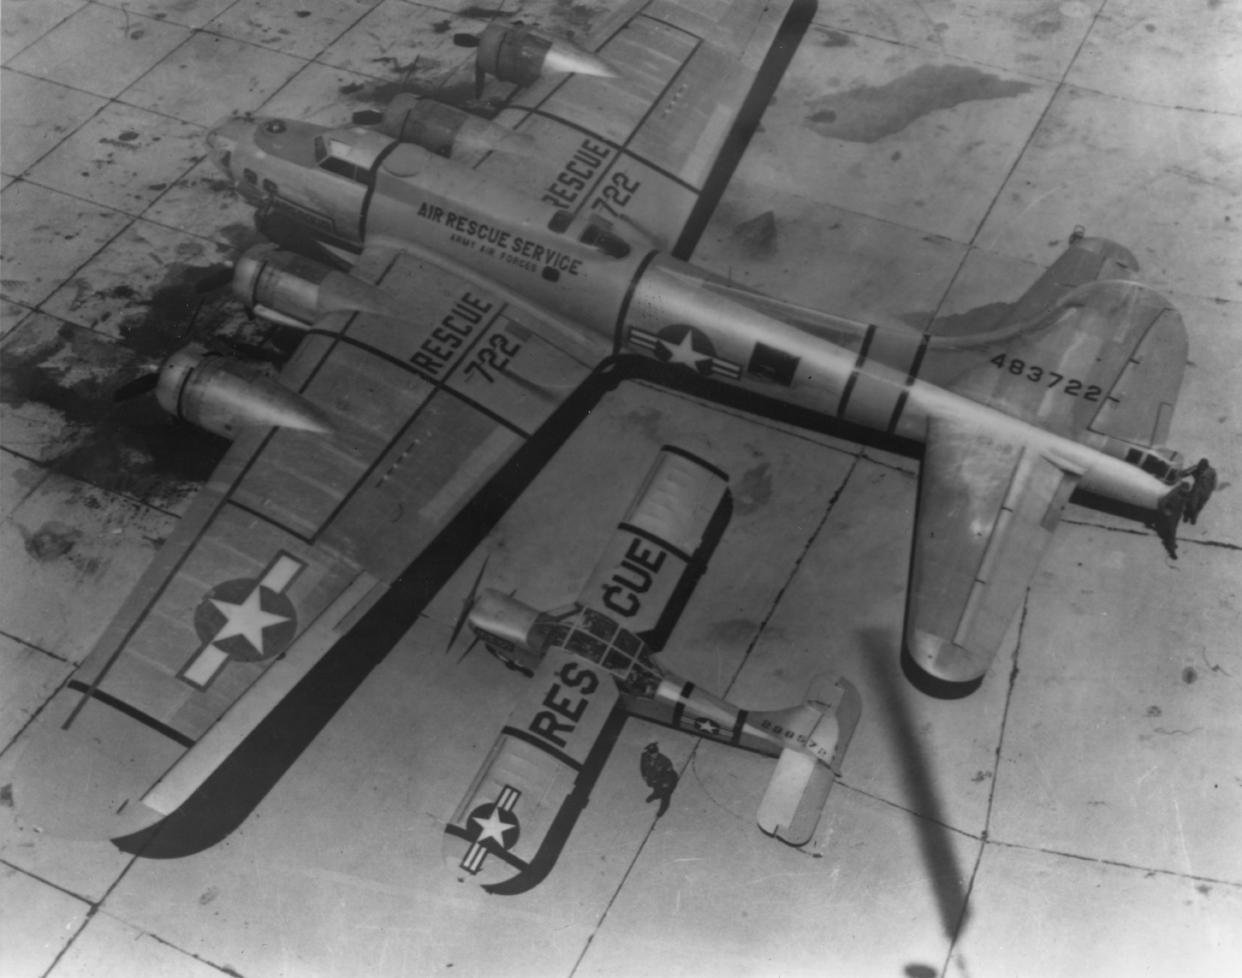 B-17 #44-83722